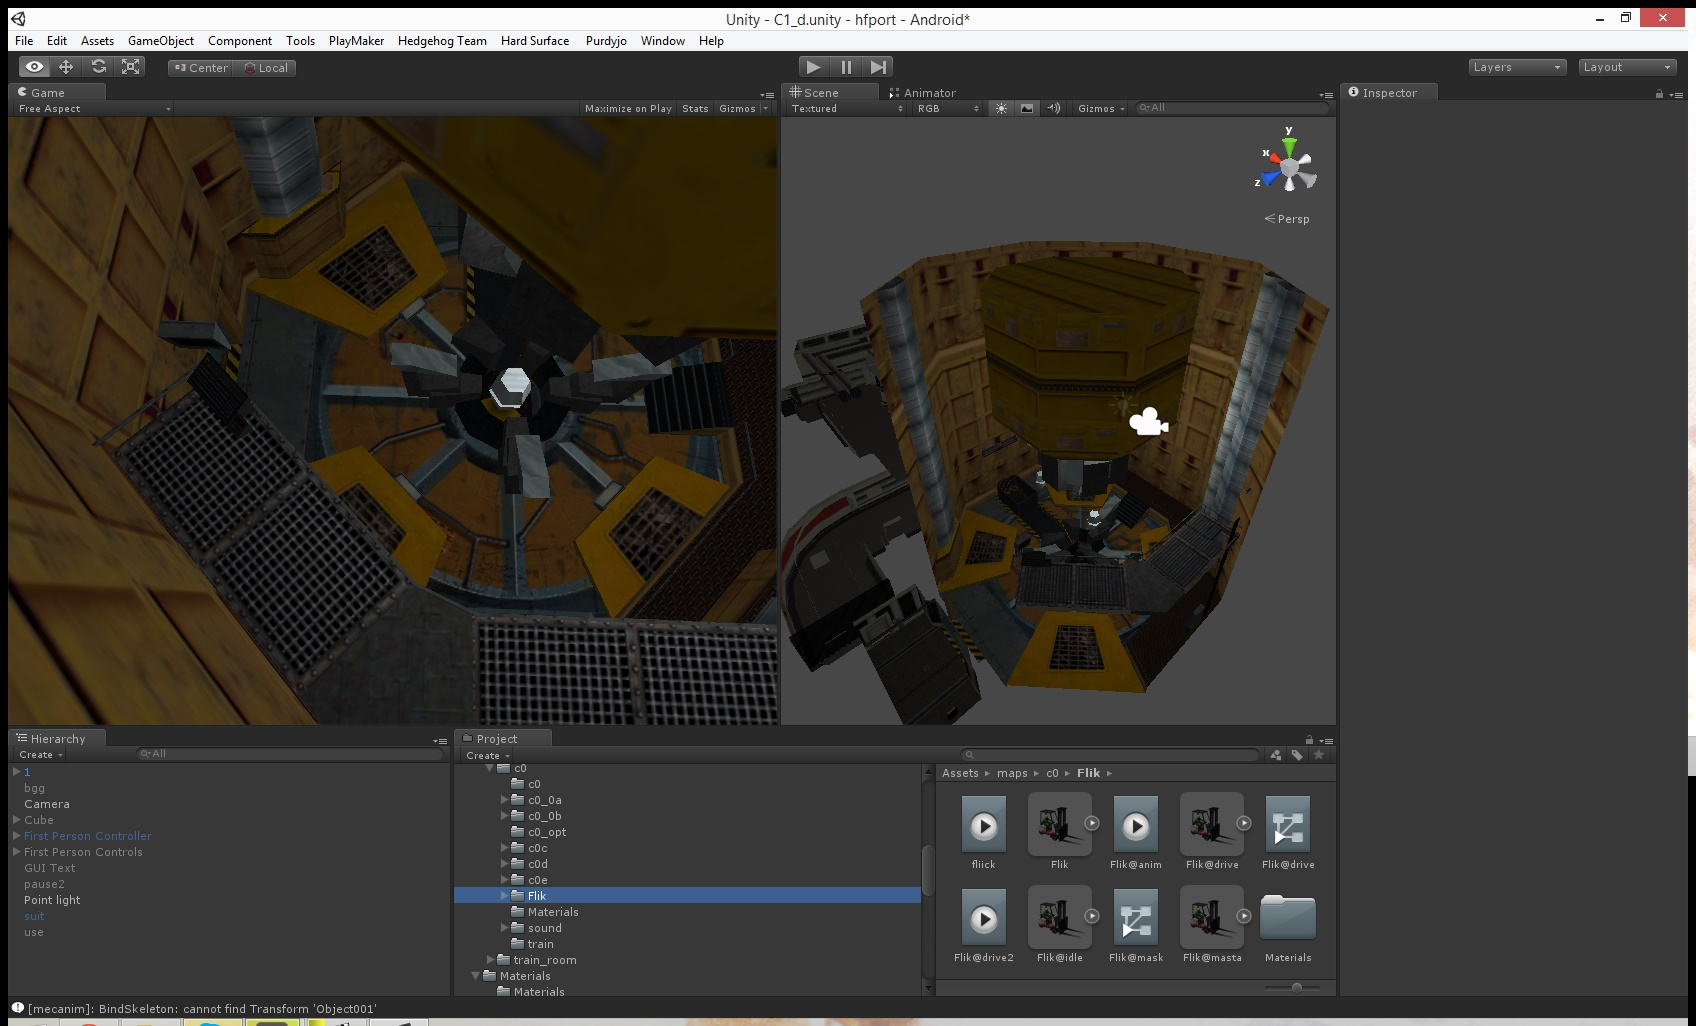 A development screenshot of Half-Life Mobile